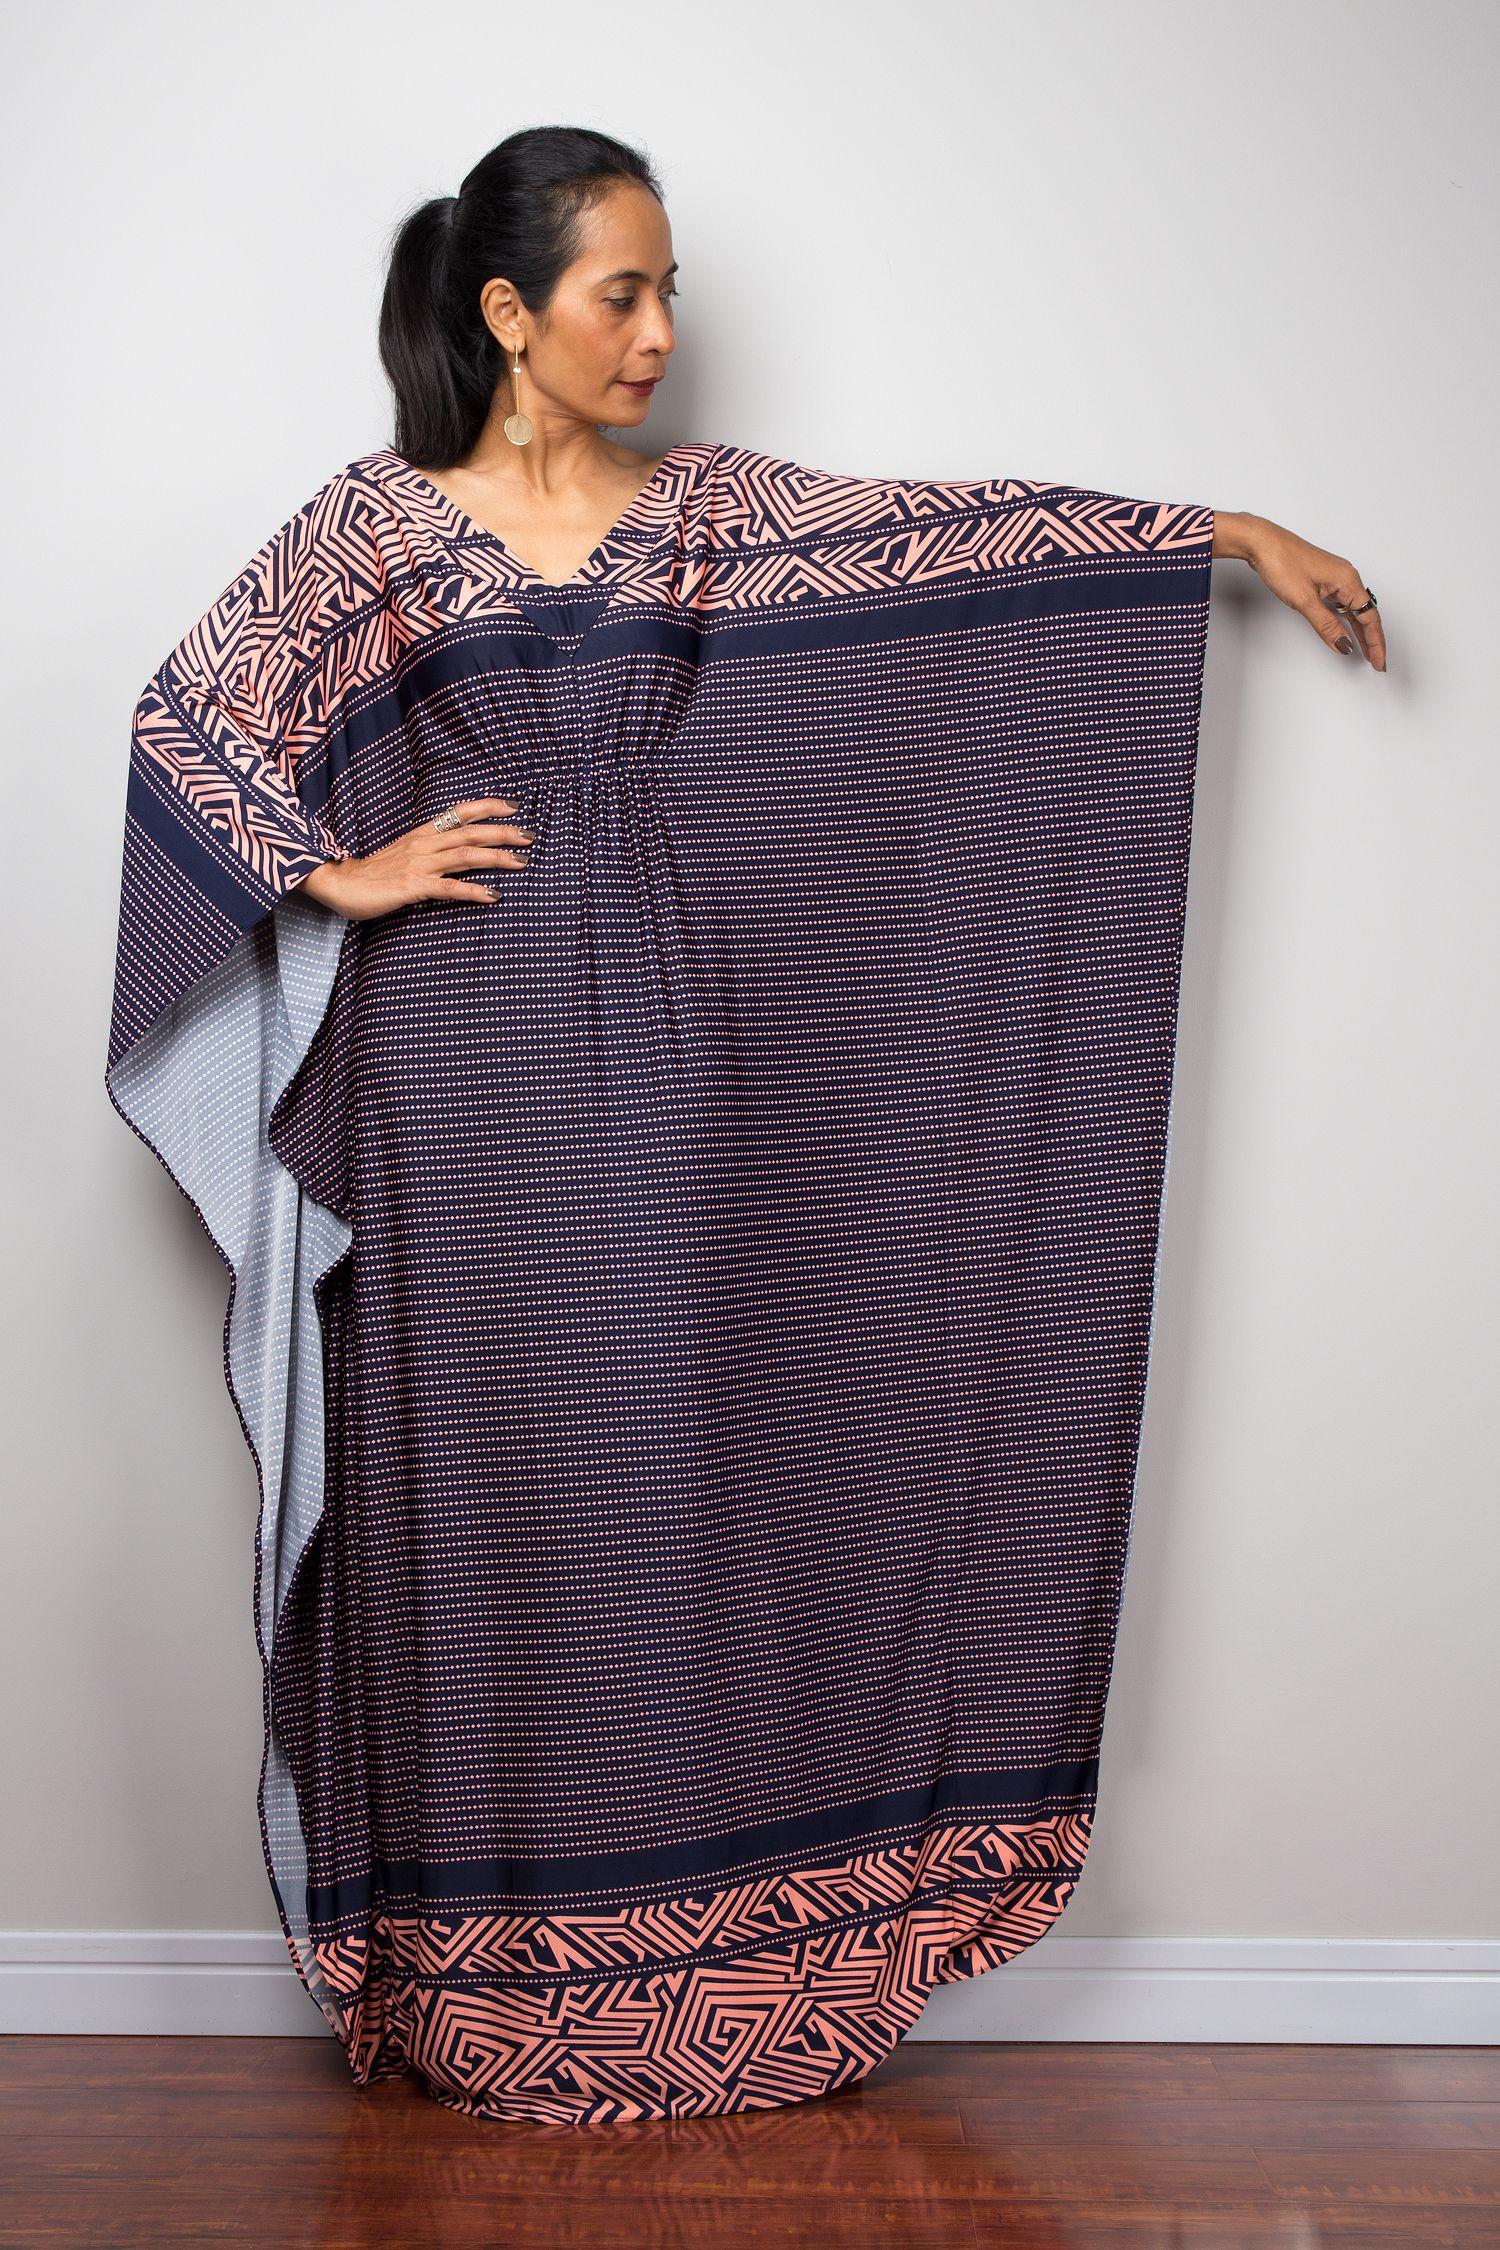 887c99fd00d1 Oversized Blue and Pink Kaftan Dress - Frock Dress - Loose fit Maxi ...